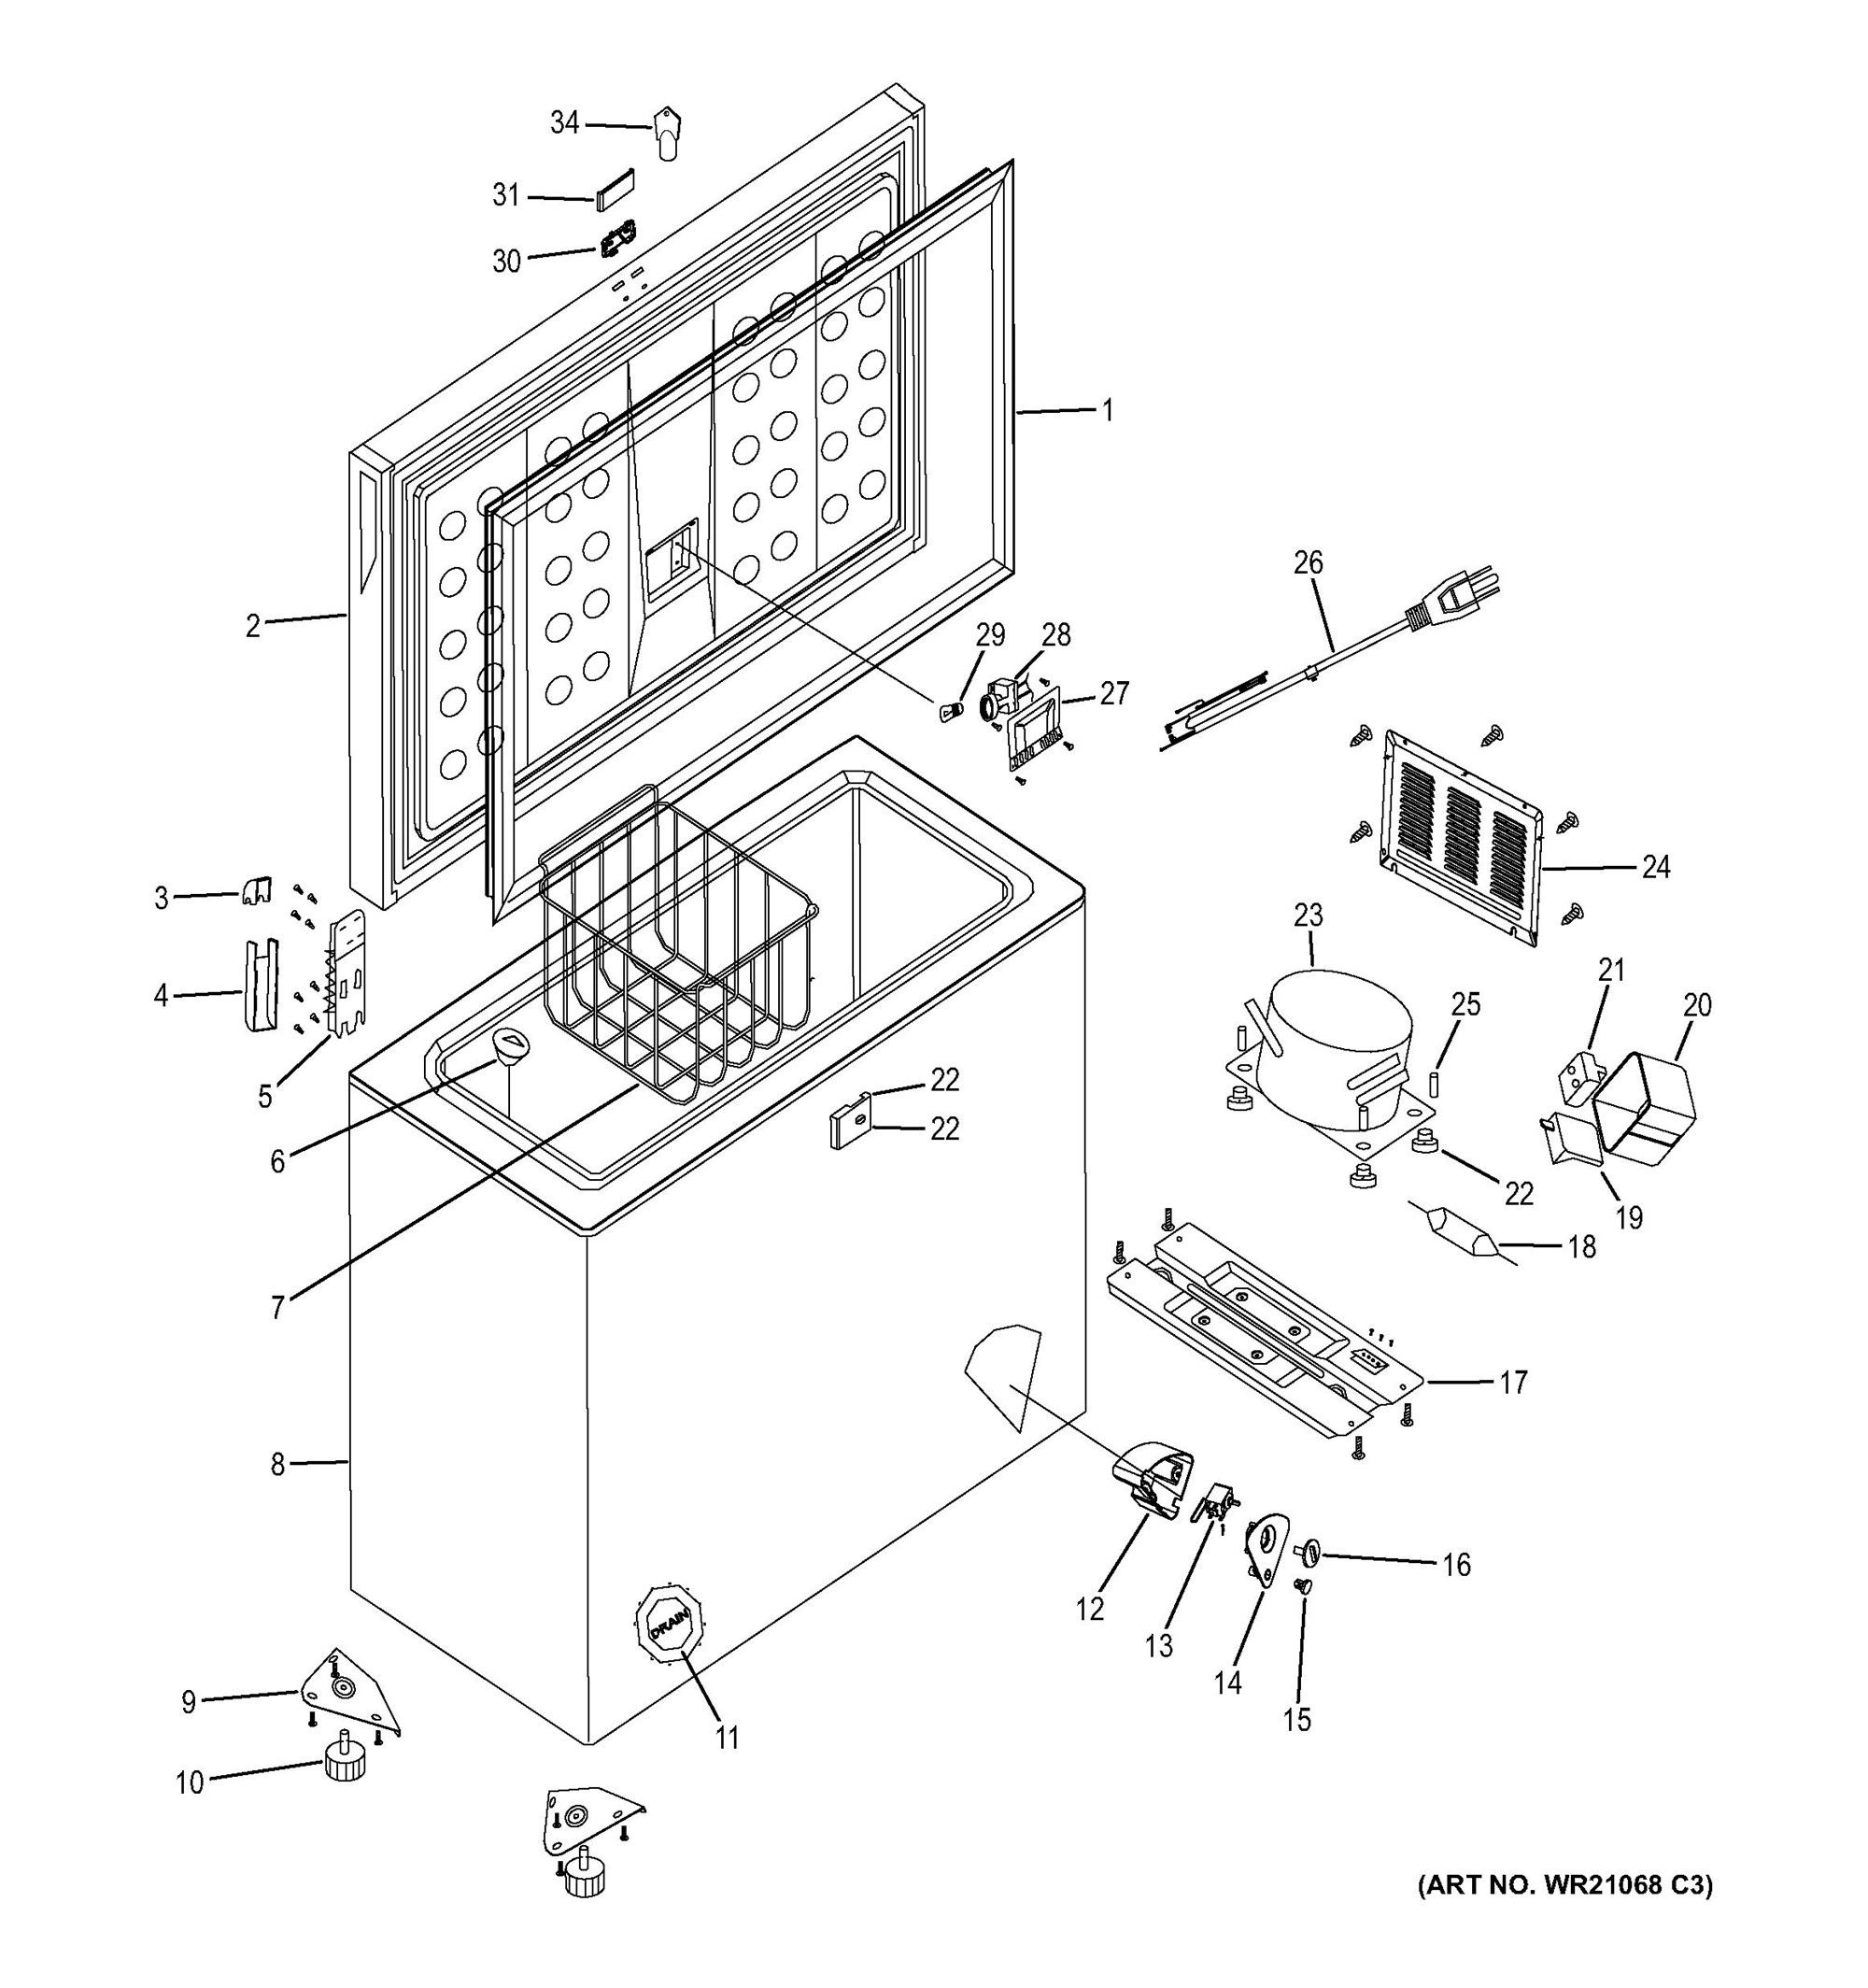 Fcm11phbww Freezer Parts General Electric Appliance